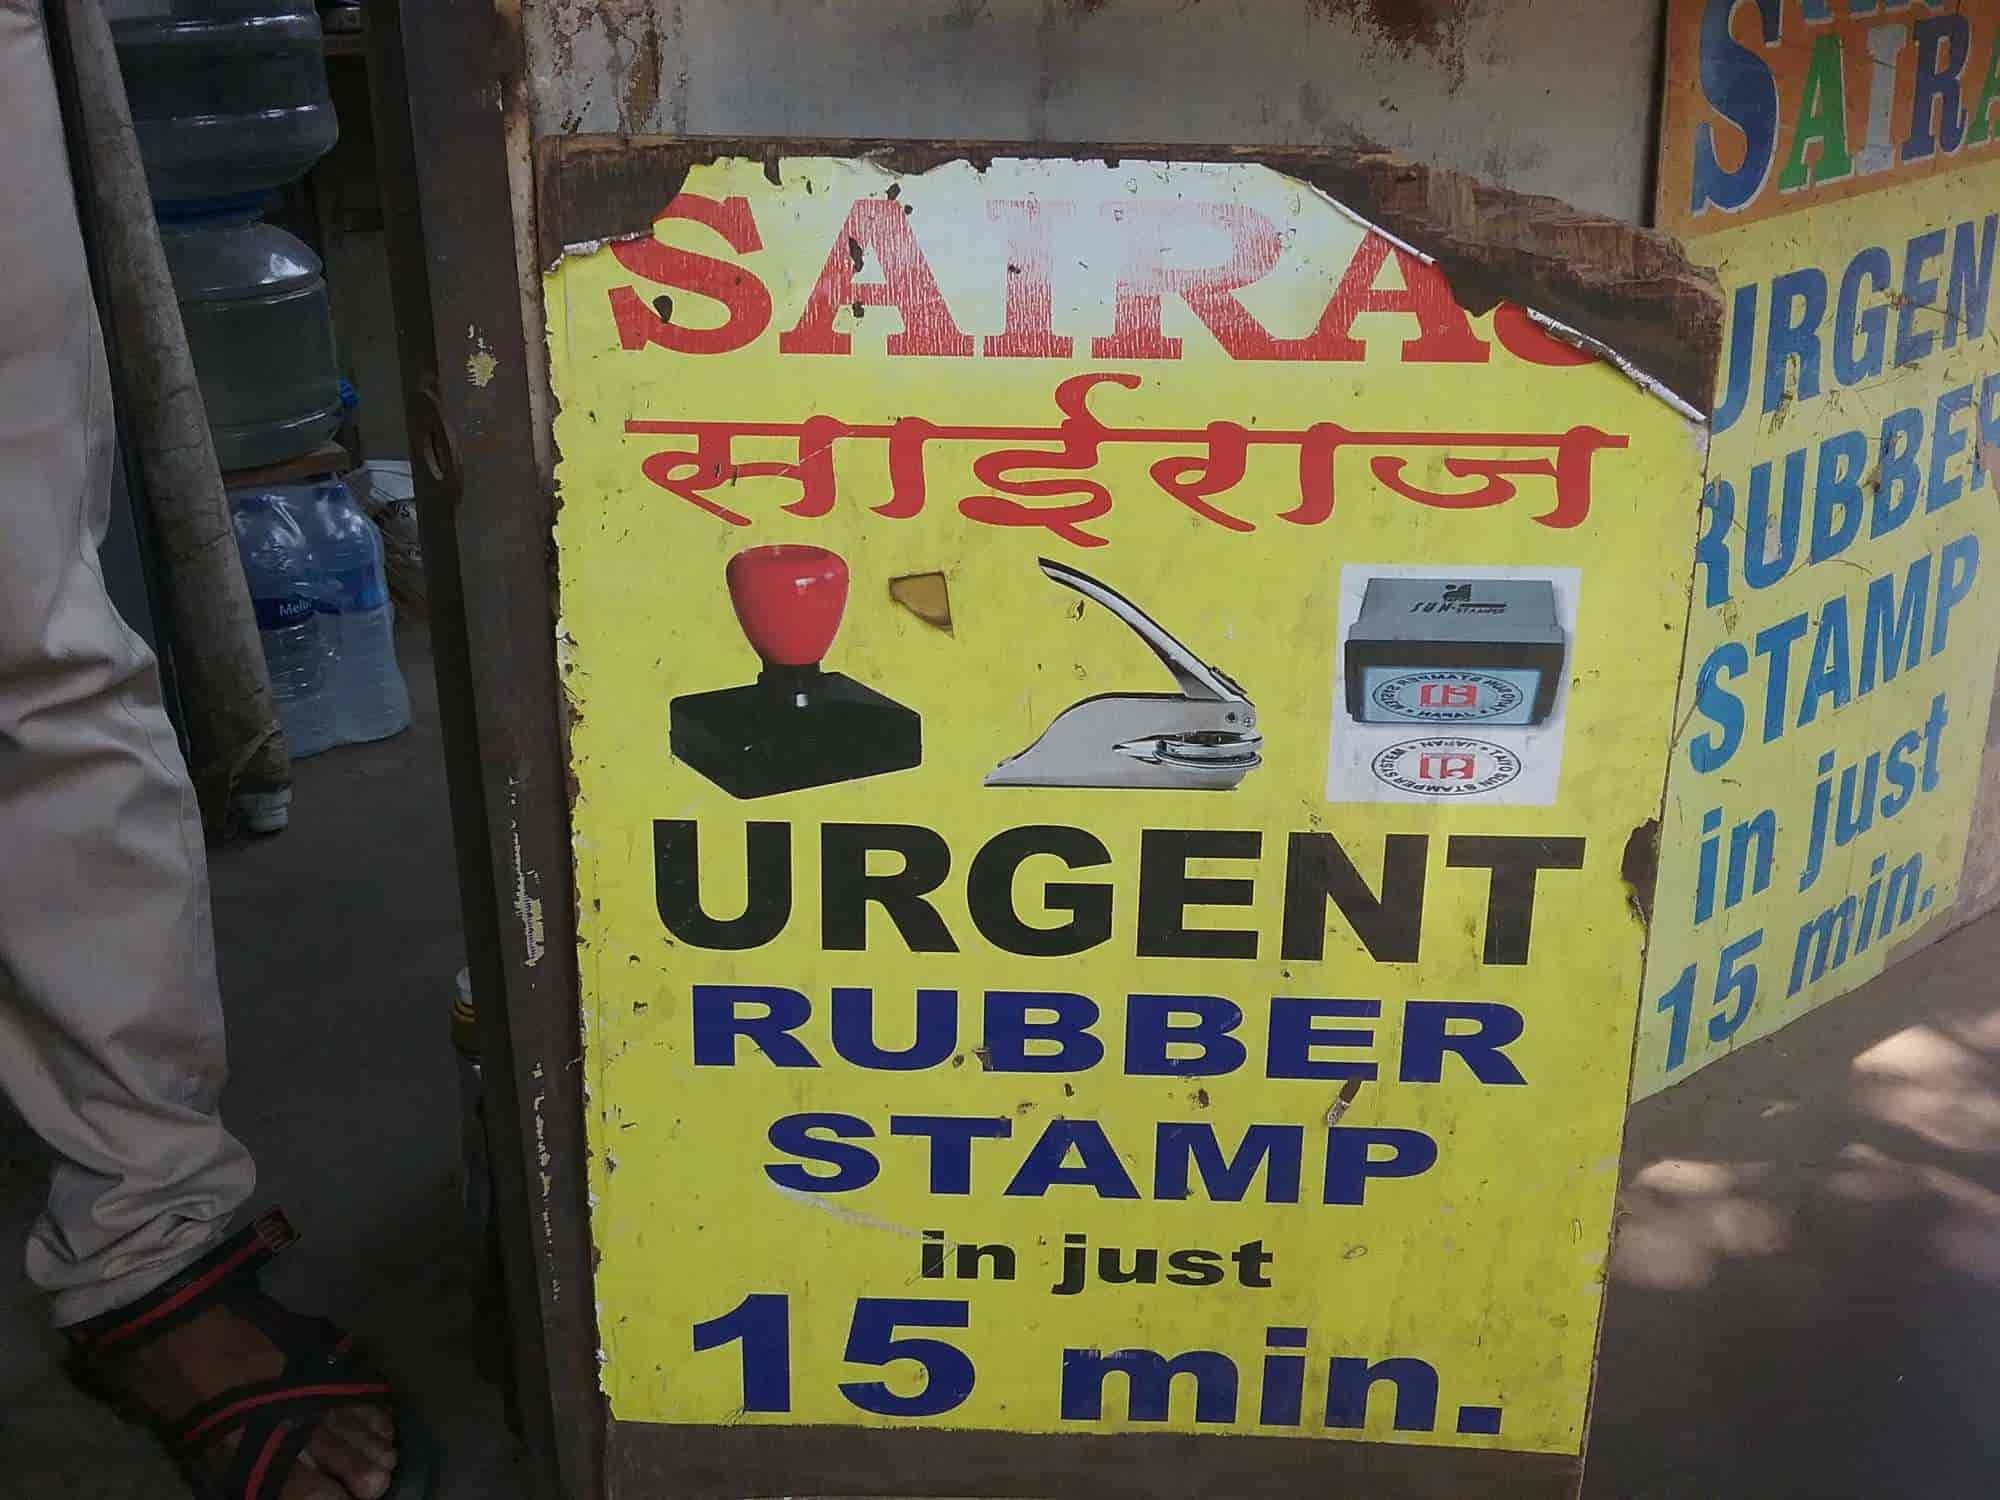 Sairaj Urgent Rubber Stamp, Andheri East - Rubber Stamp